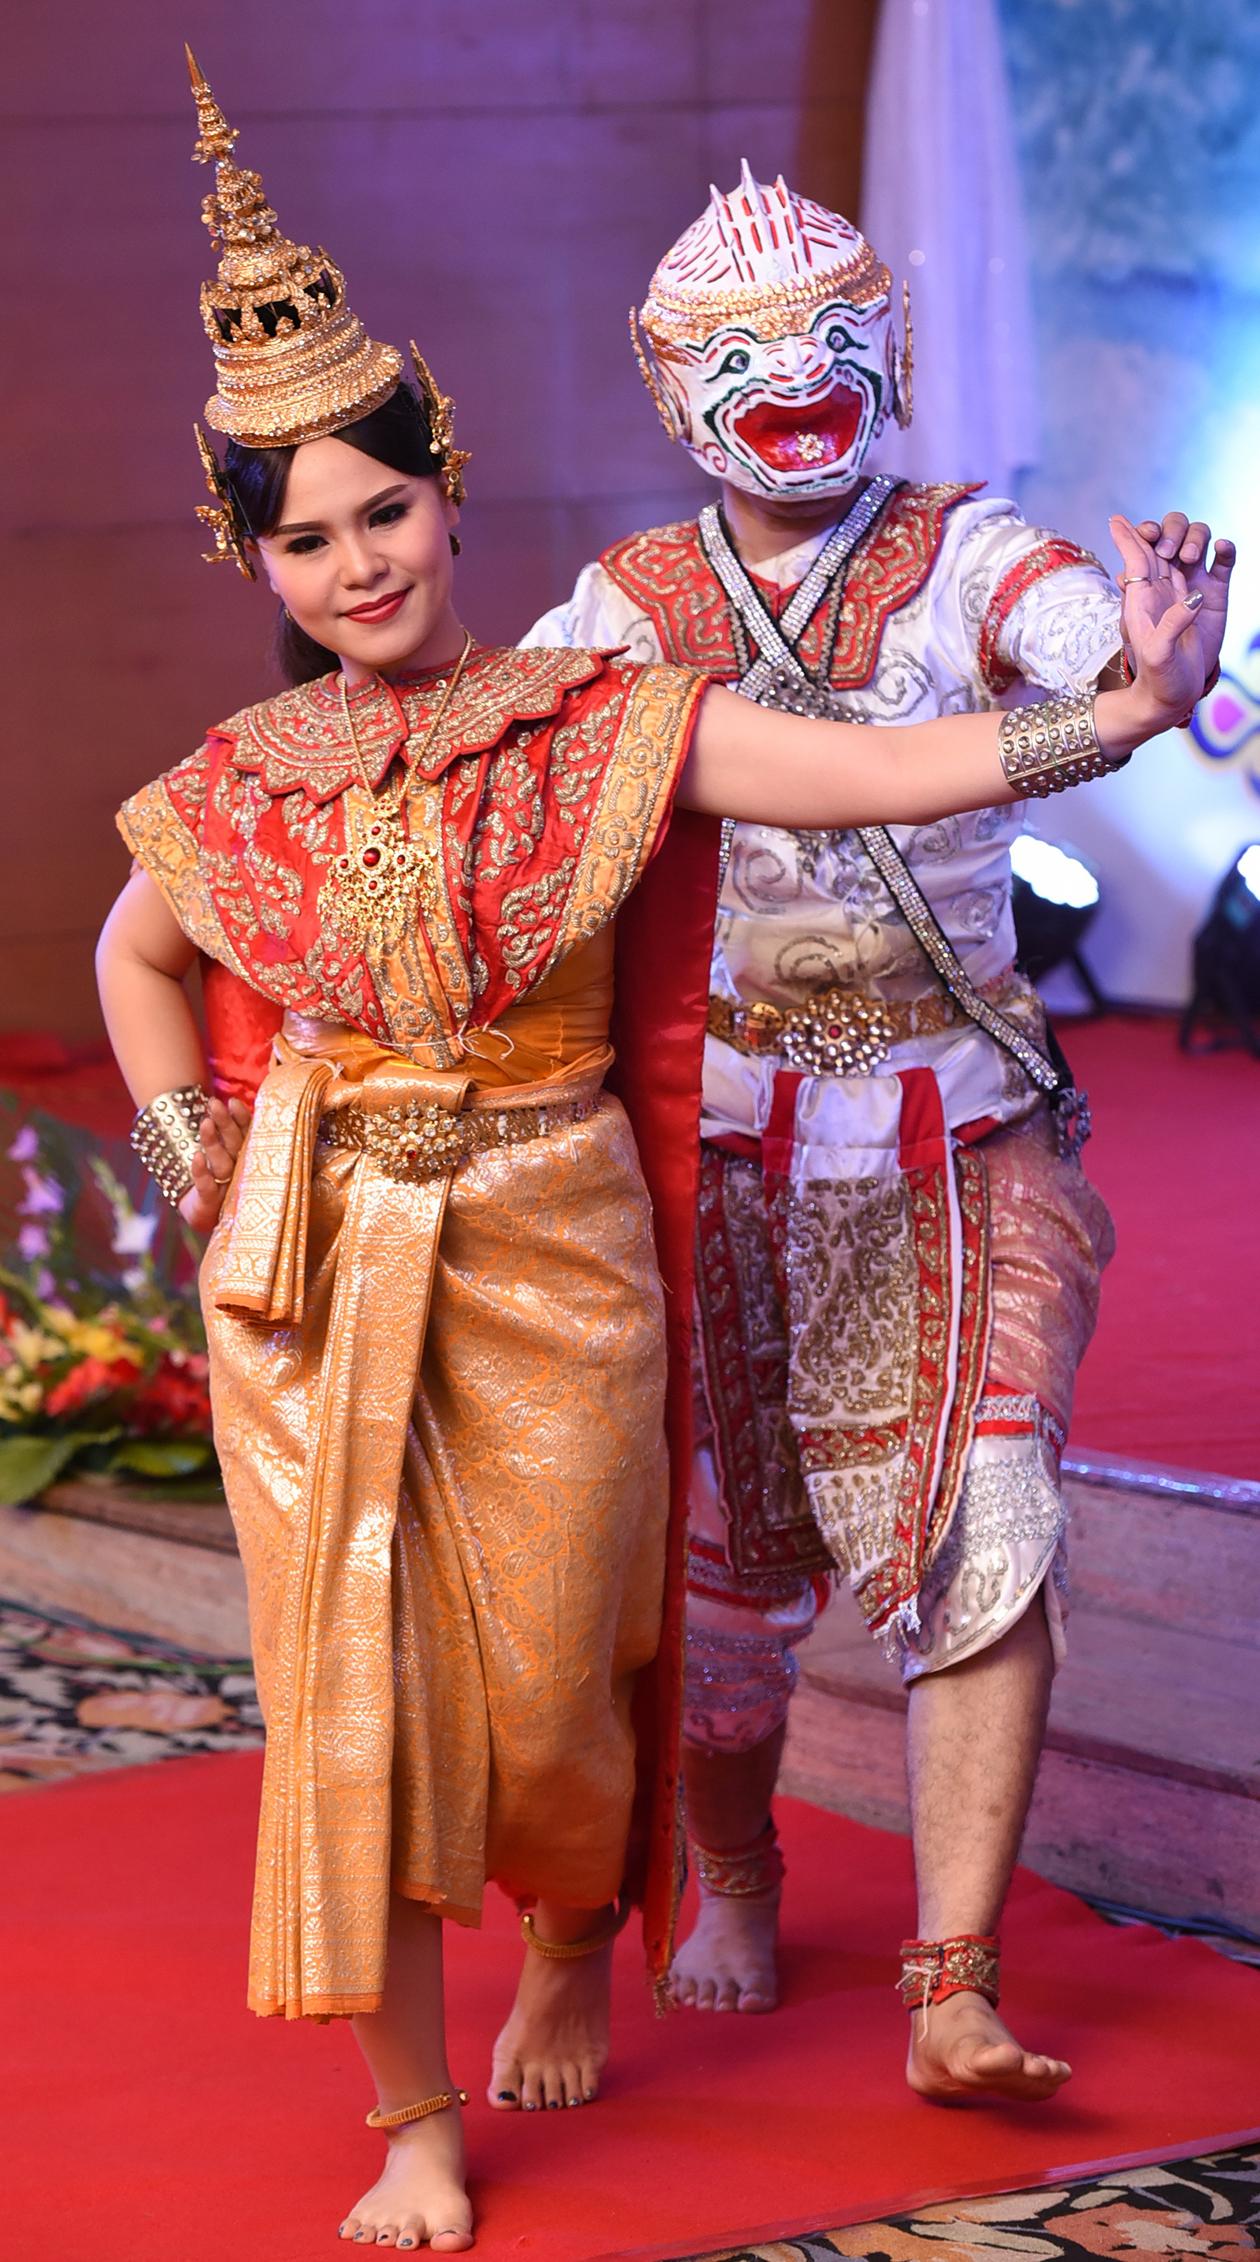 A Thai dance representation of the Ramayana